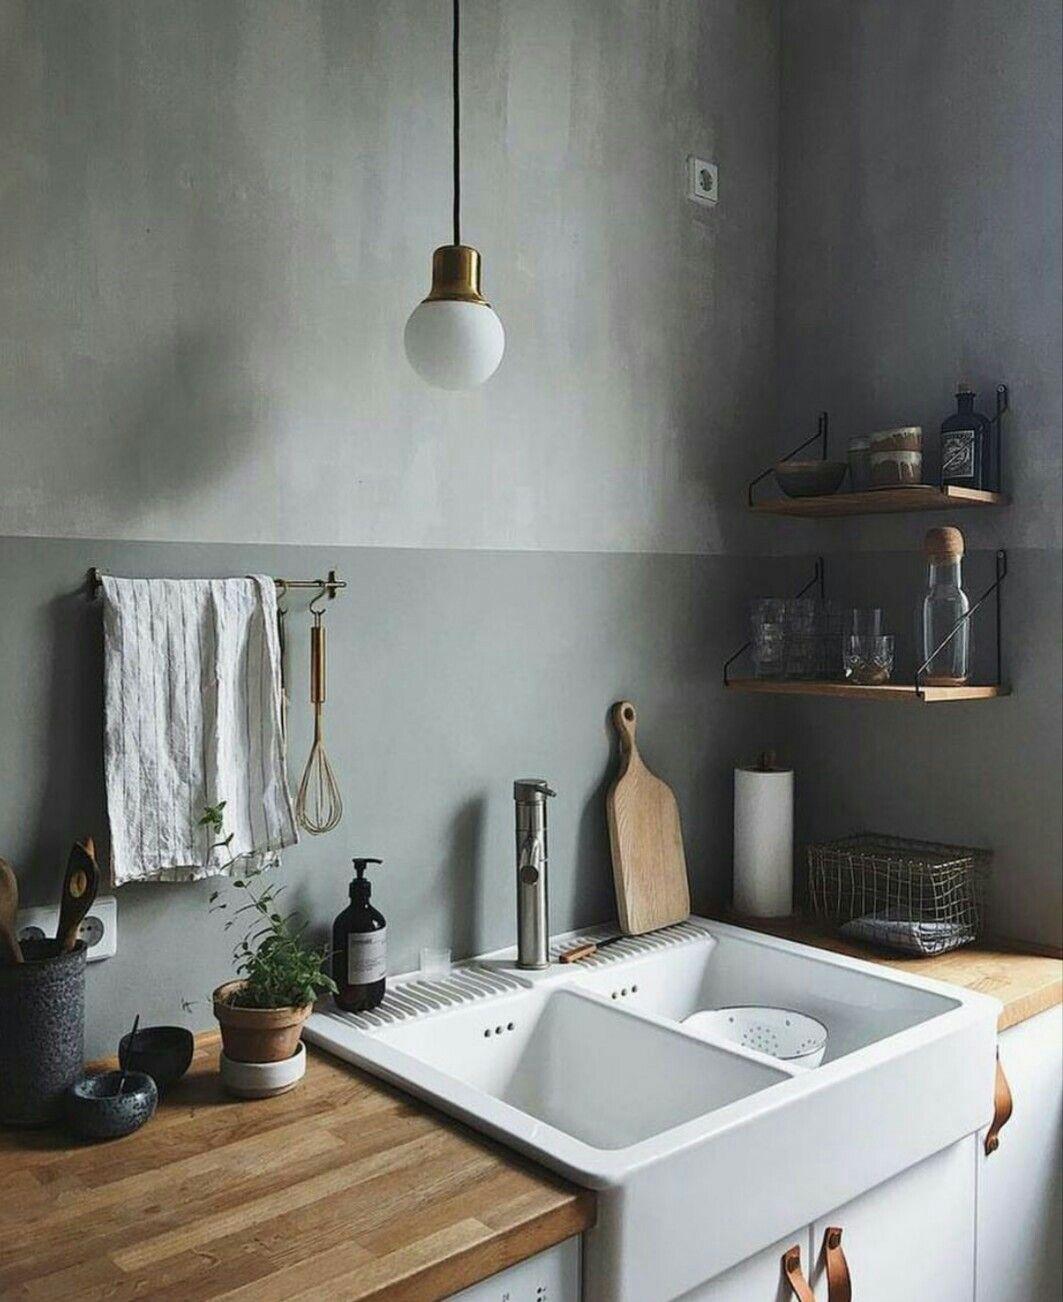 Pin by Clarissa Shearer on kitchen Minimalism interior